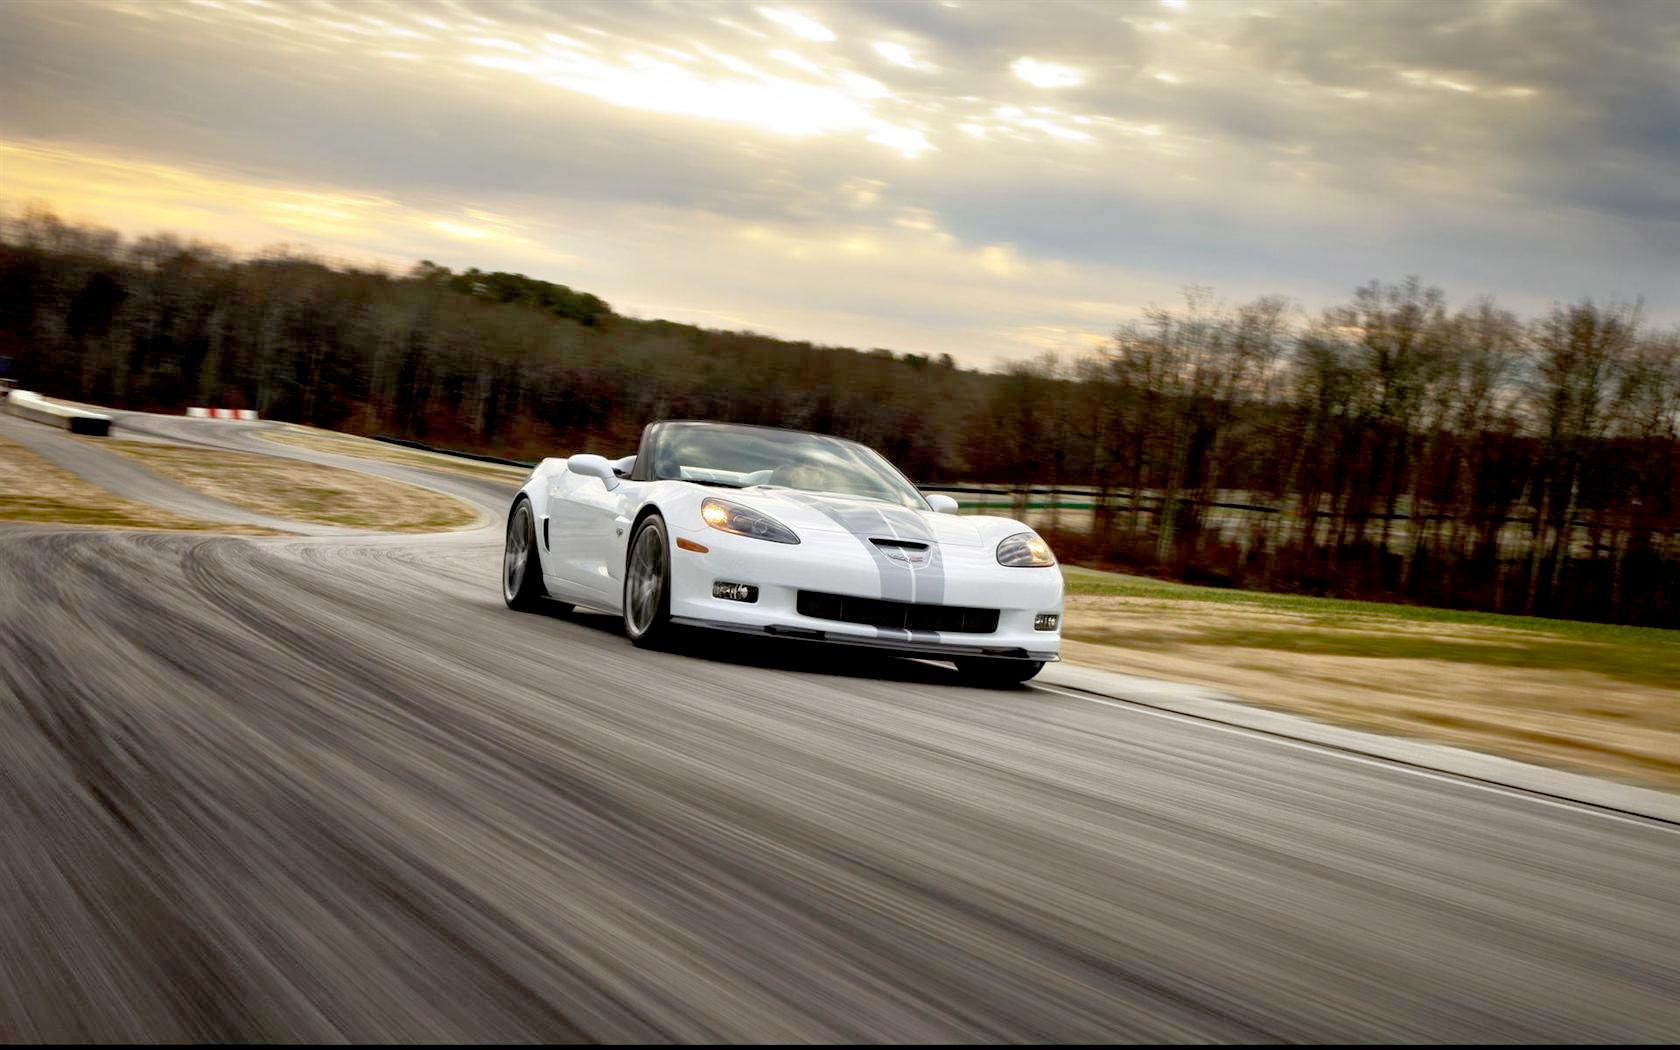 Corvette 2013 - Chevrolet Corvette 427 Convertible